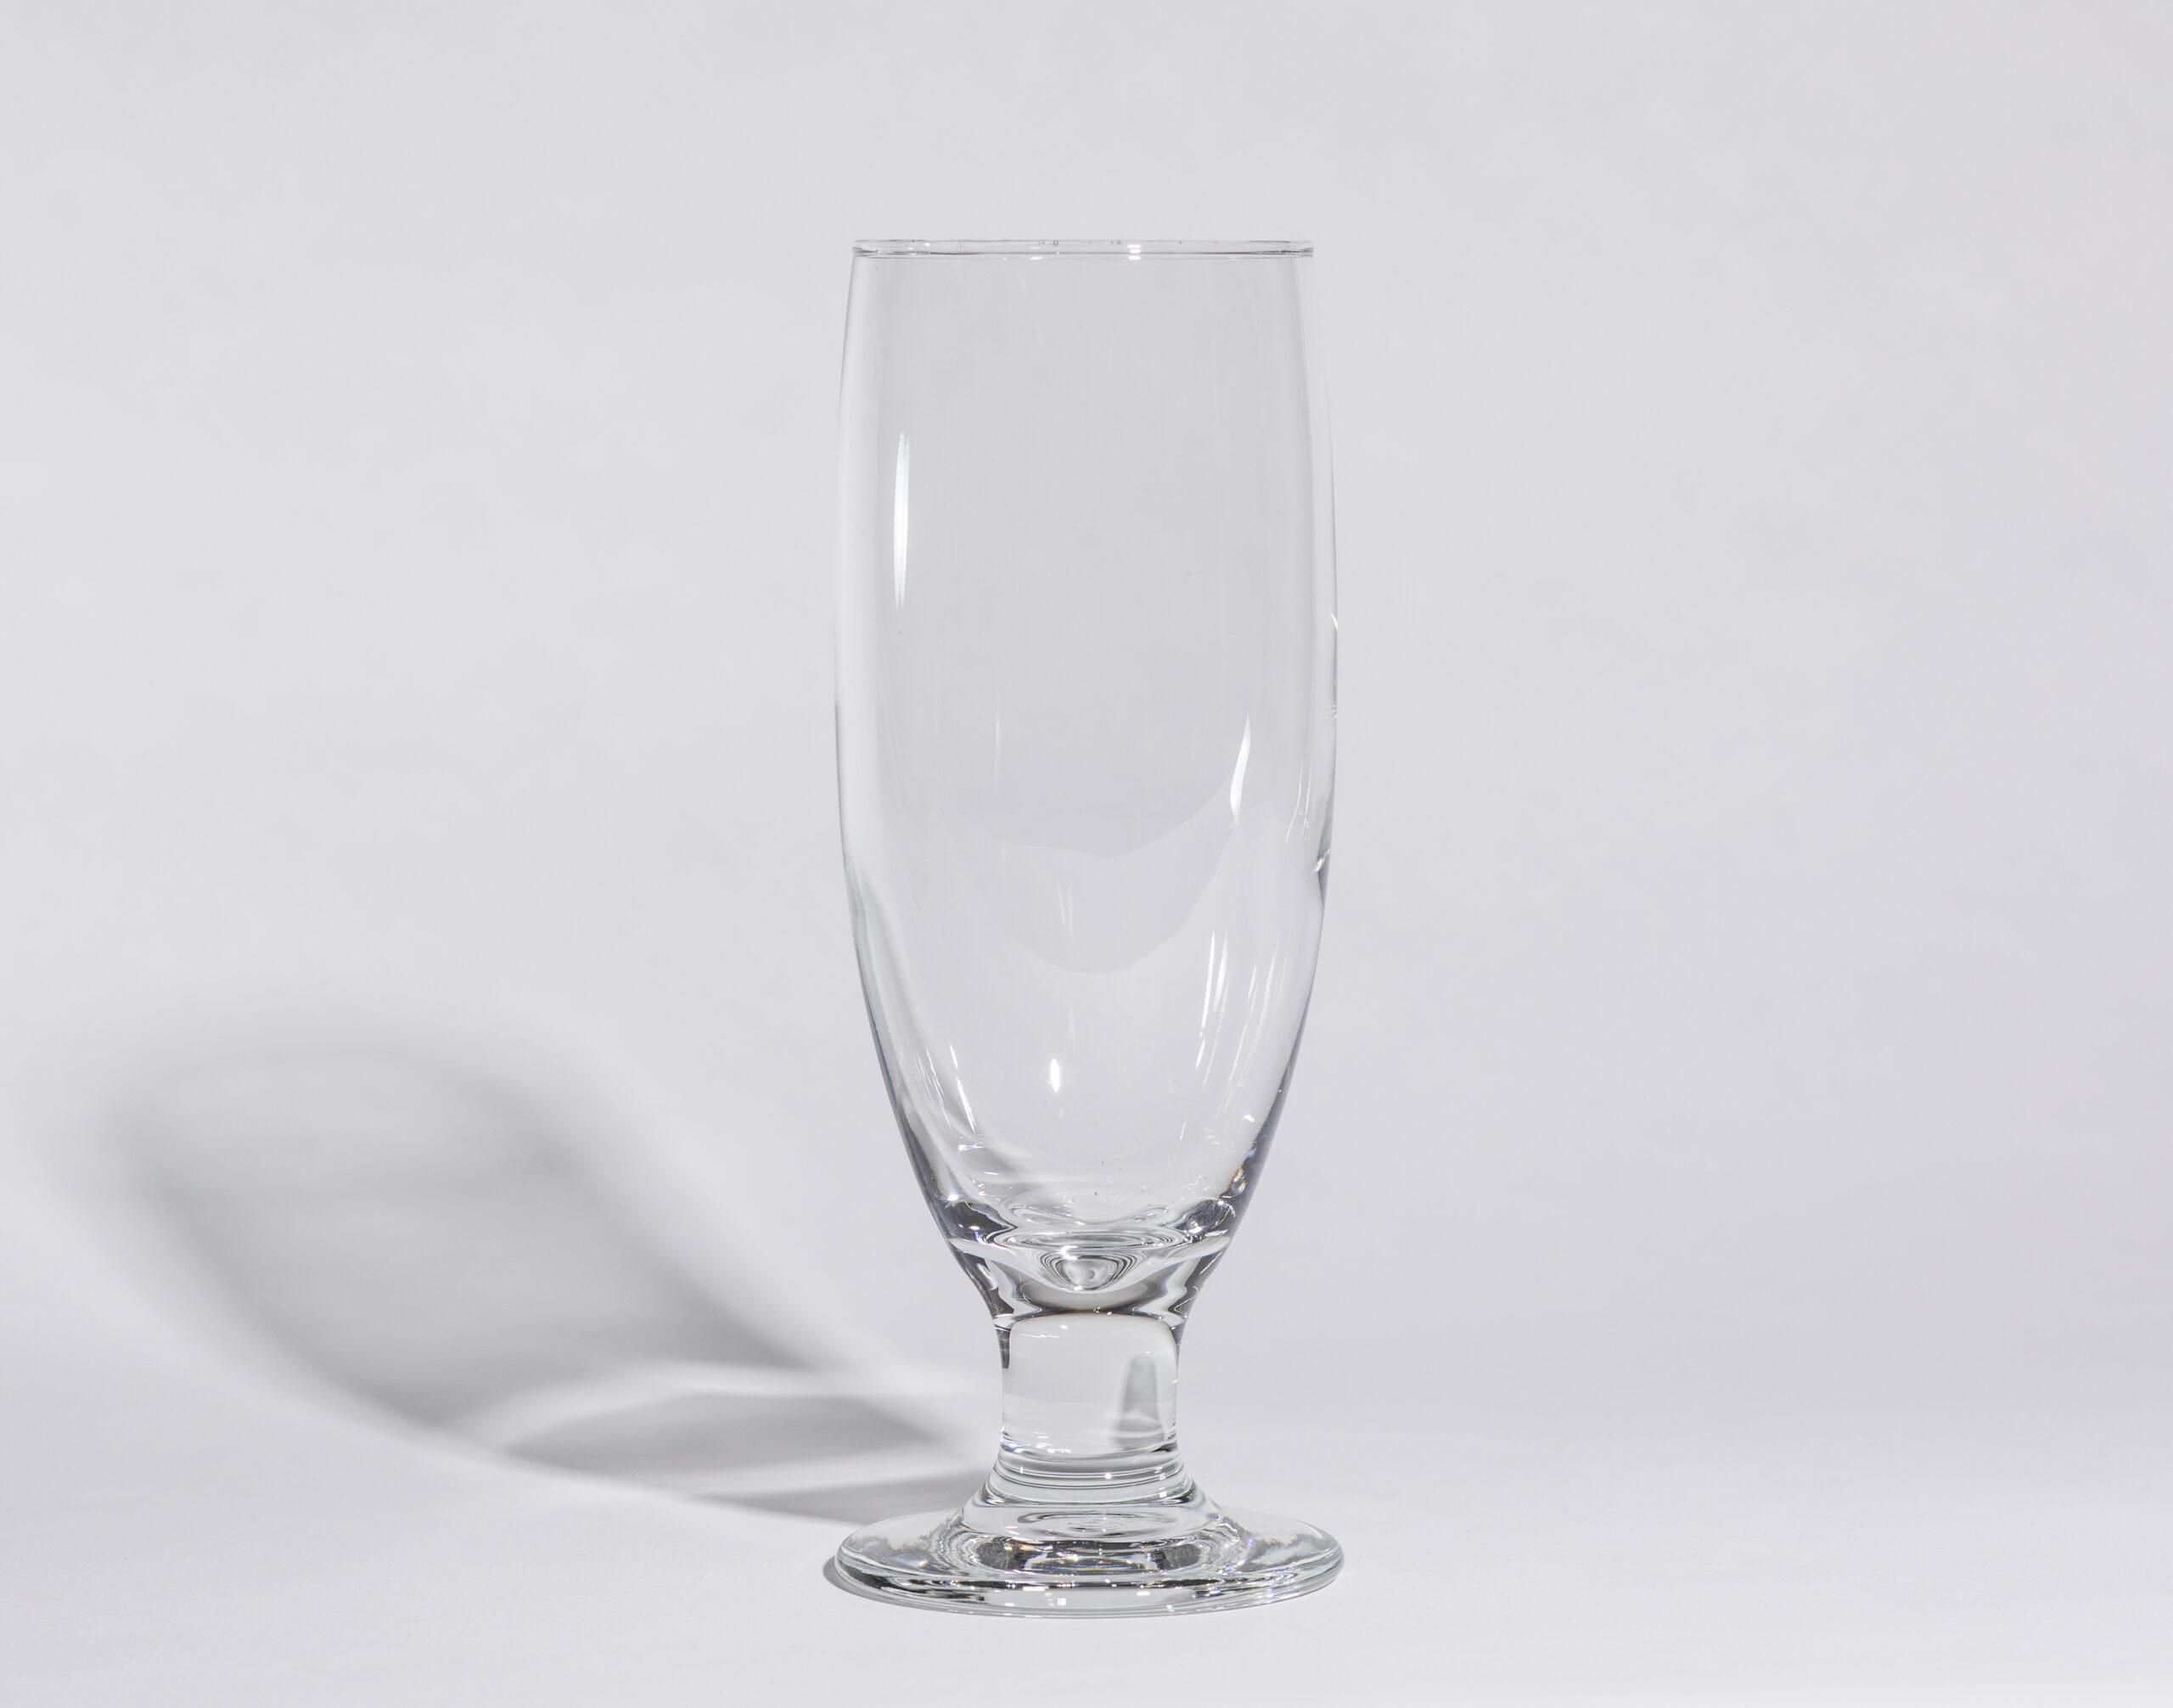 Water glasses (12oz, stemmed)